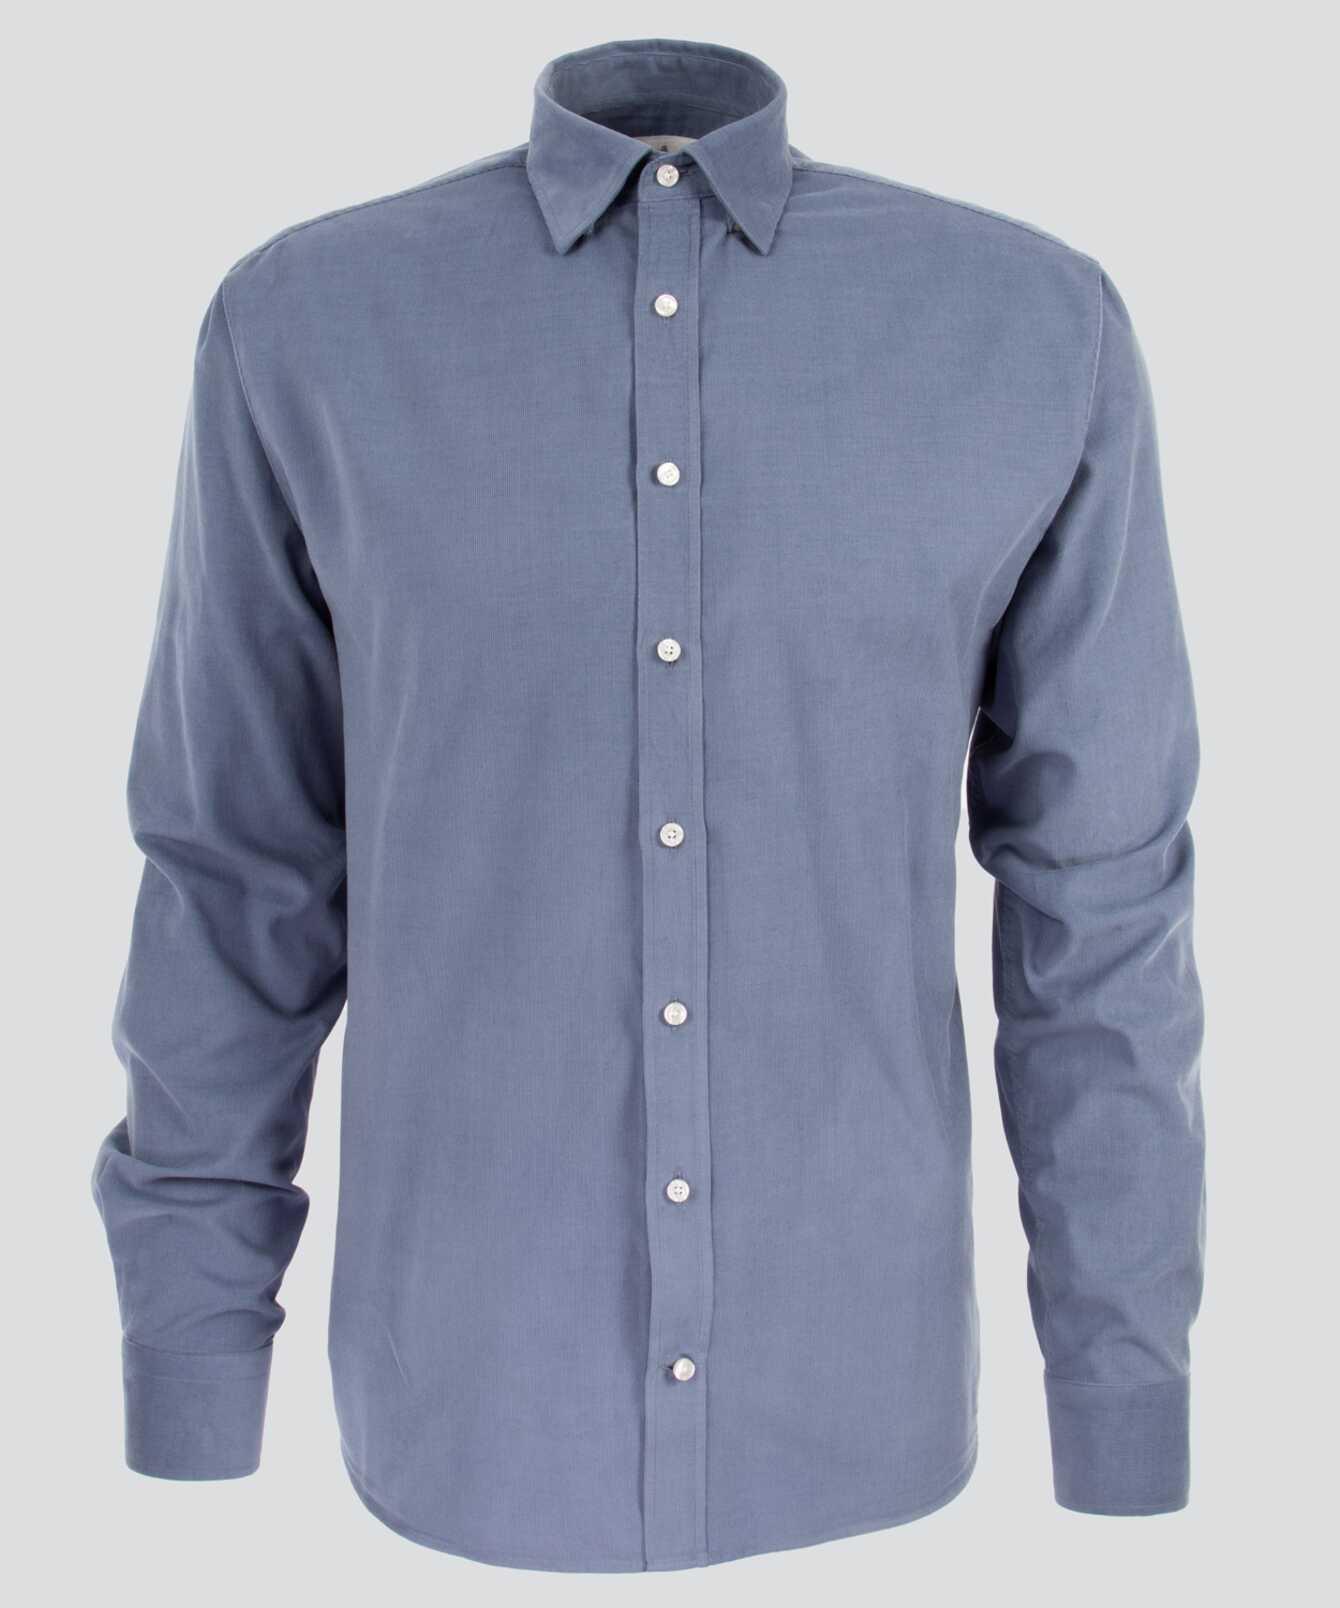 Shirt Toronto Cord Blue The Shirt Factory